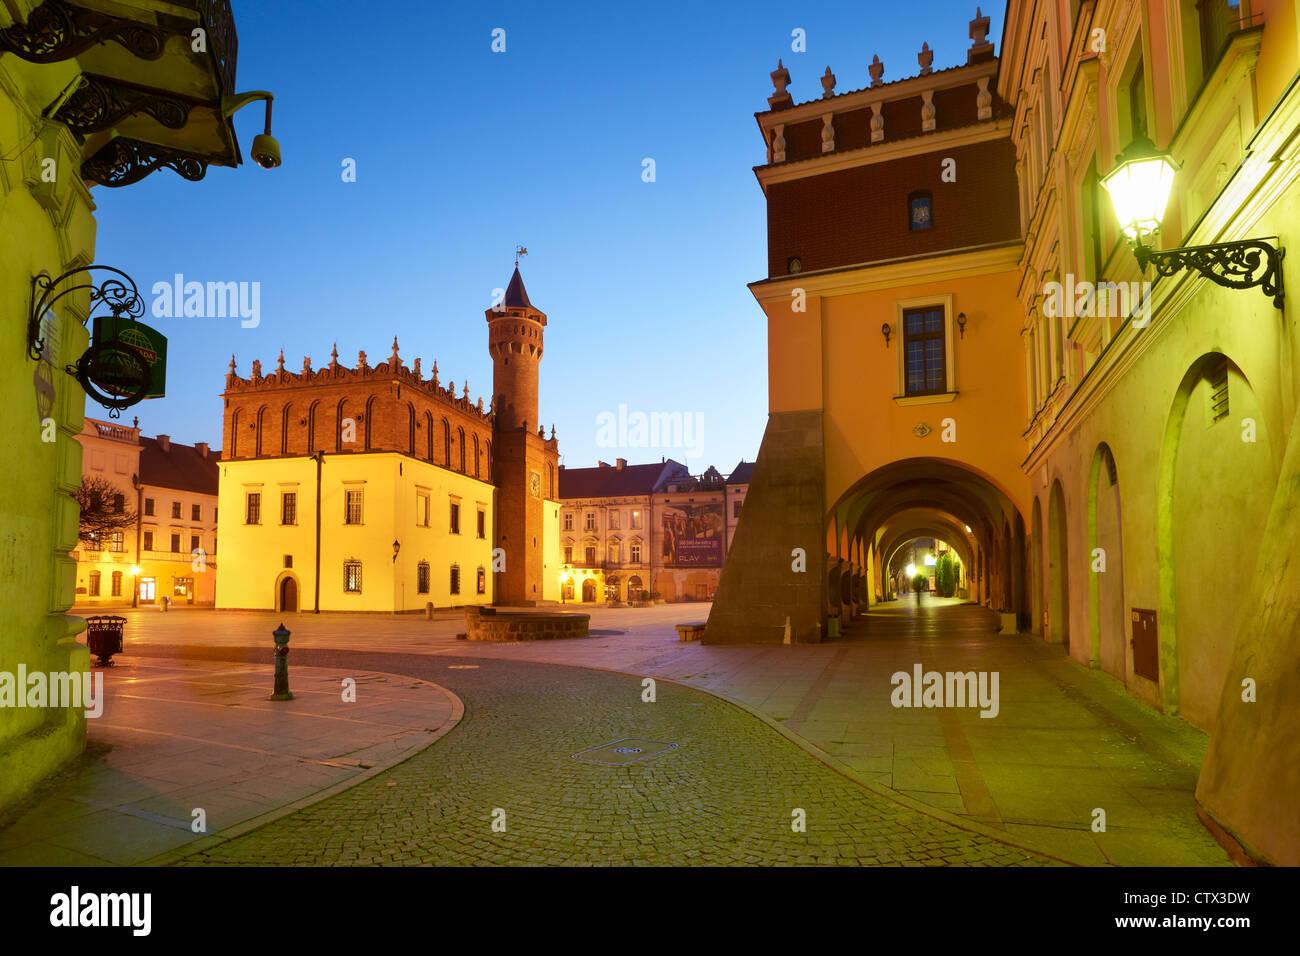 Tarnow, La Ciudad Vieja, de Polonia, de Europa Imagen De Stock